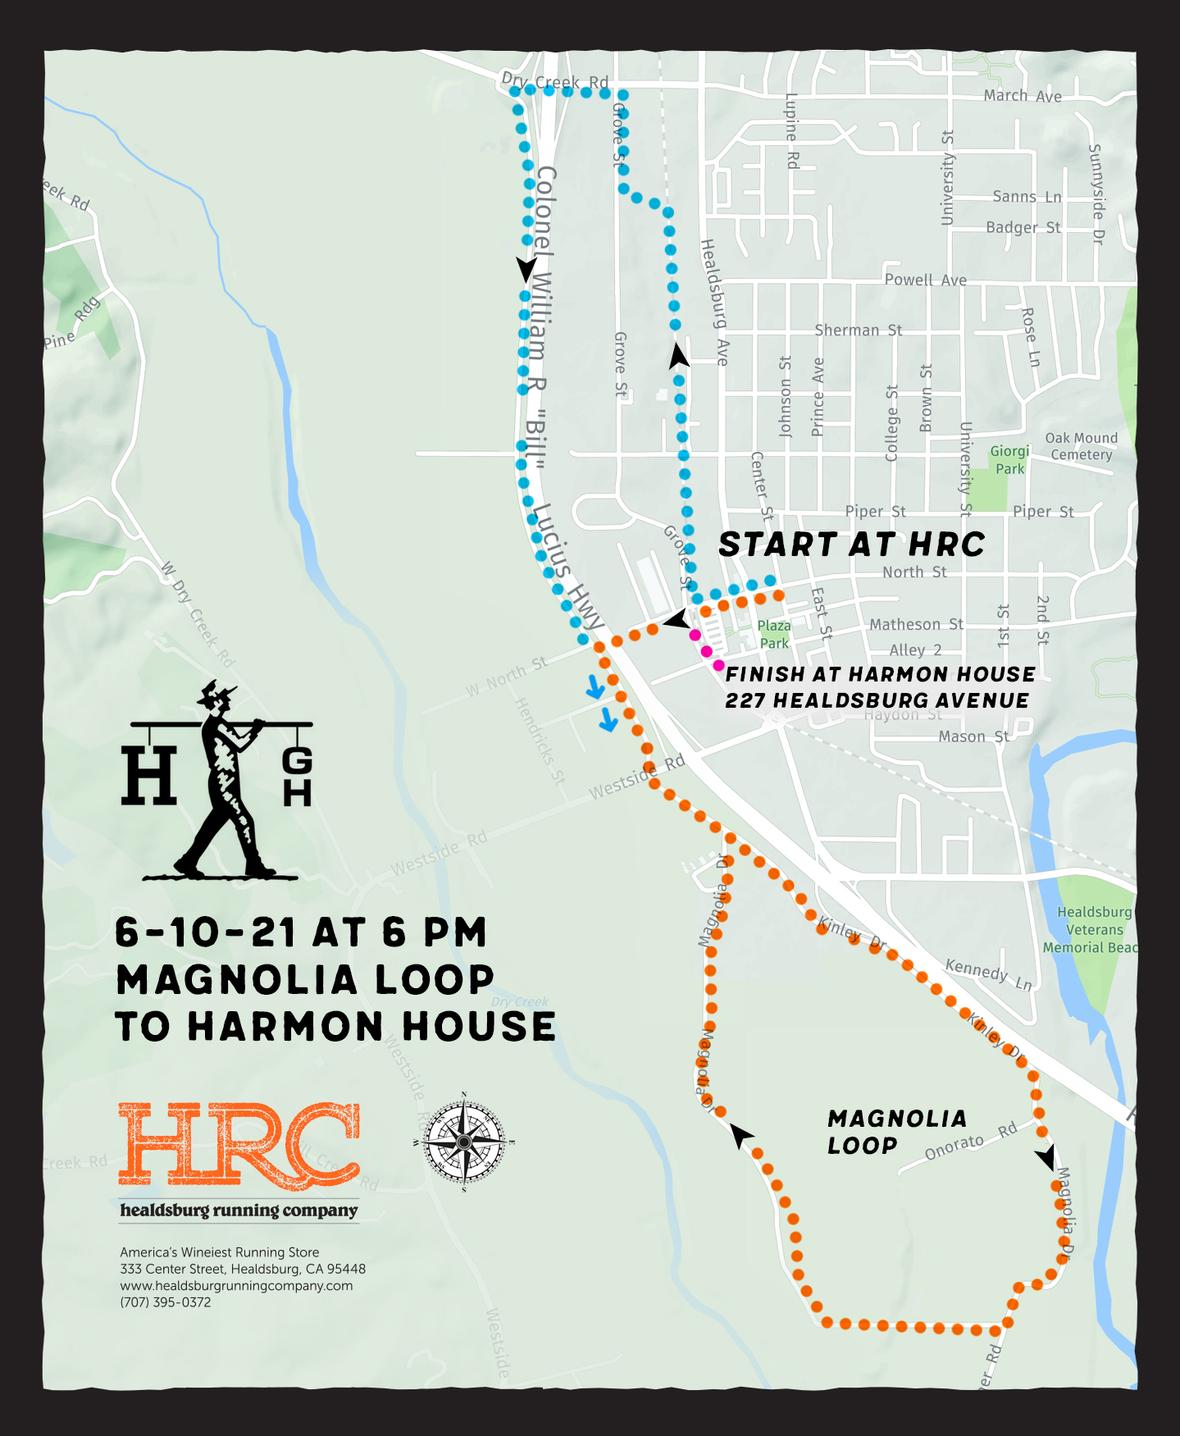 harmon house map